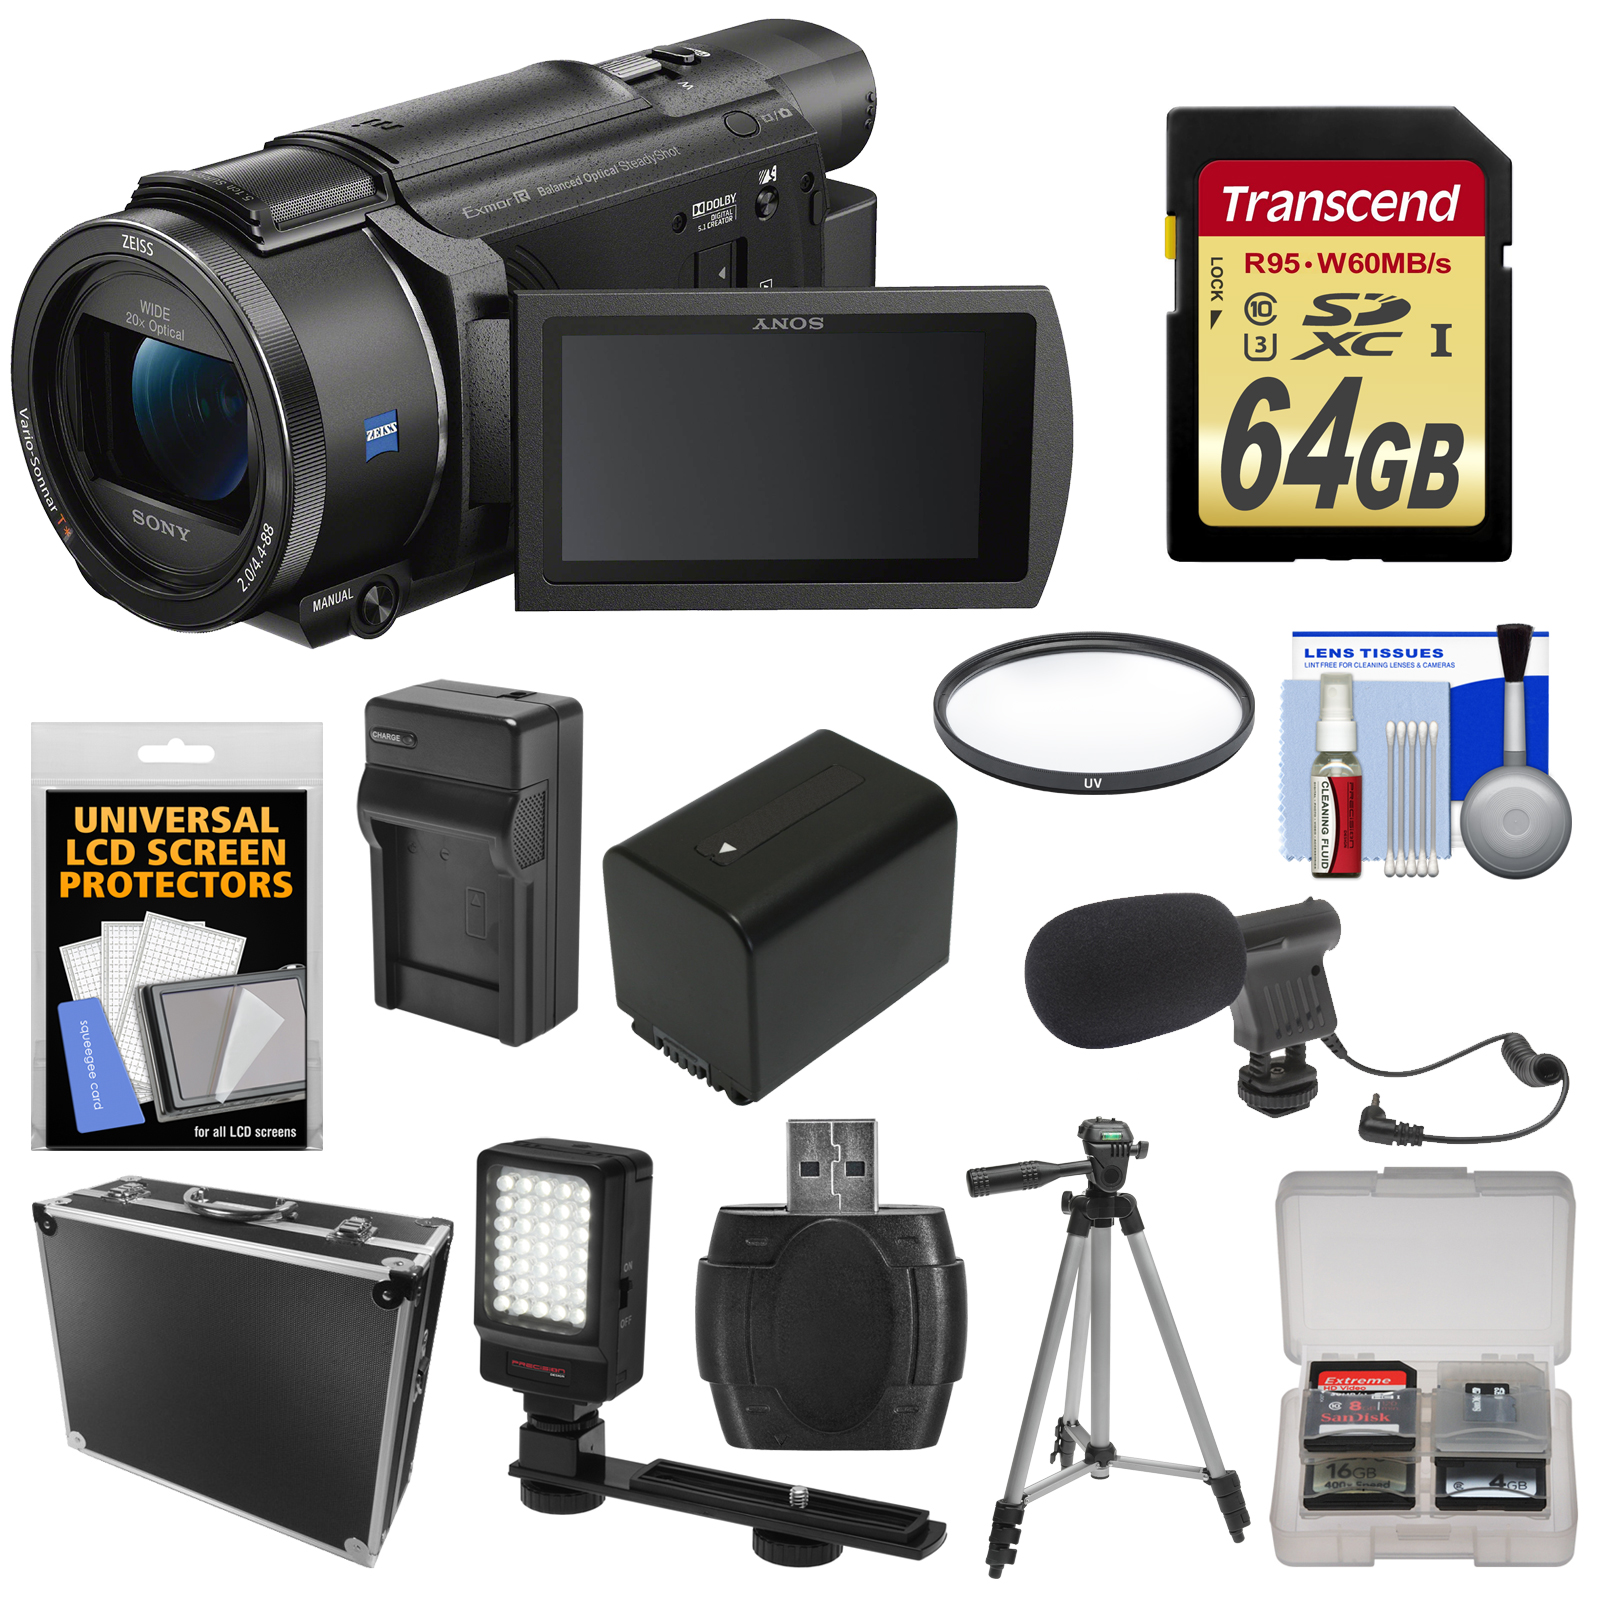 Sony Handycam Fdr Ax53 Wi Fi 4k Ultra Hd Video Camera